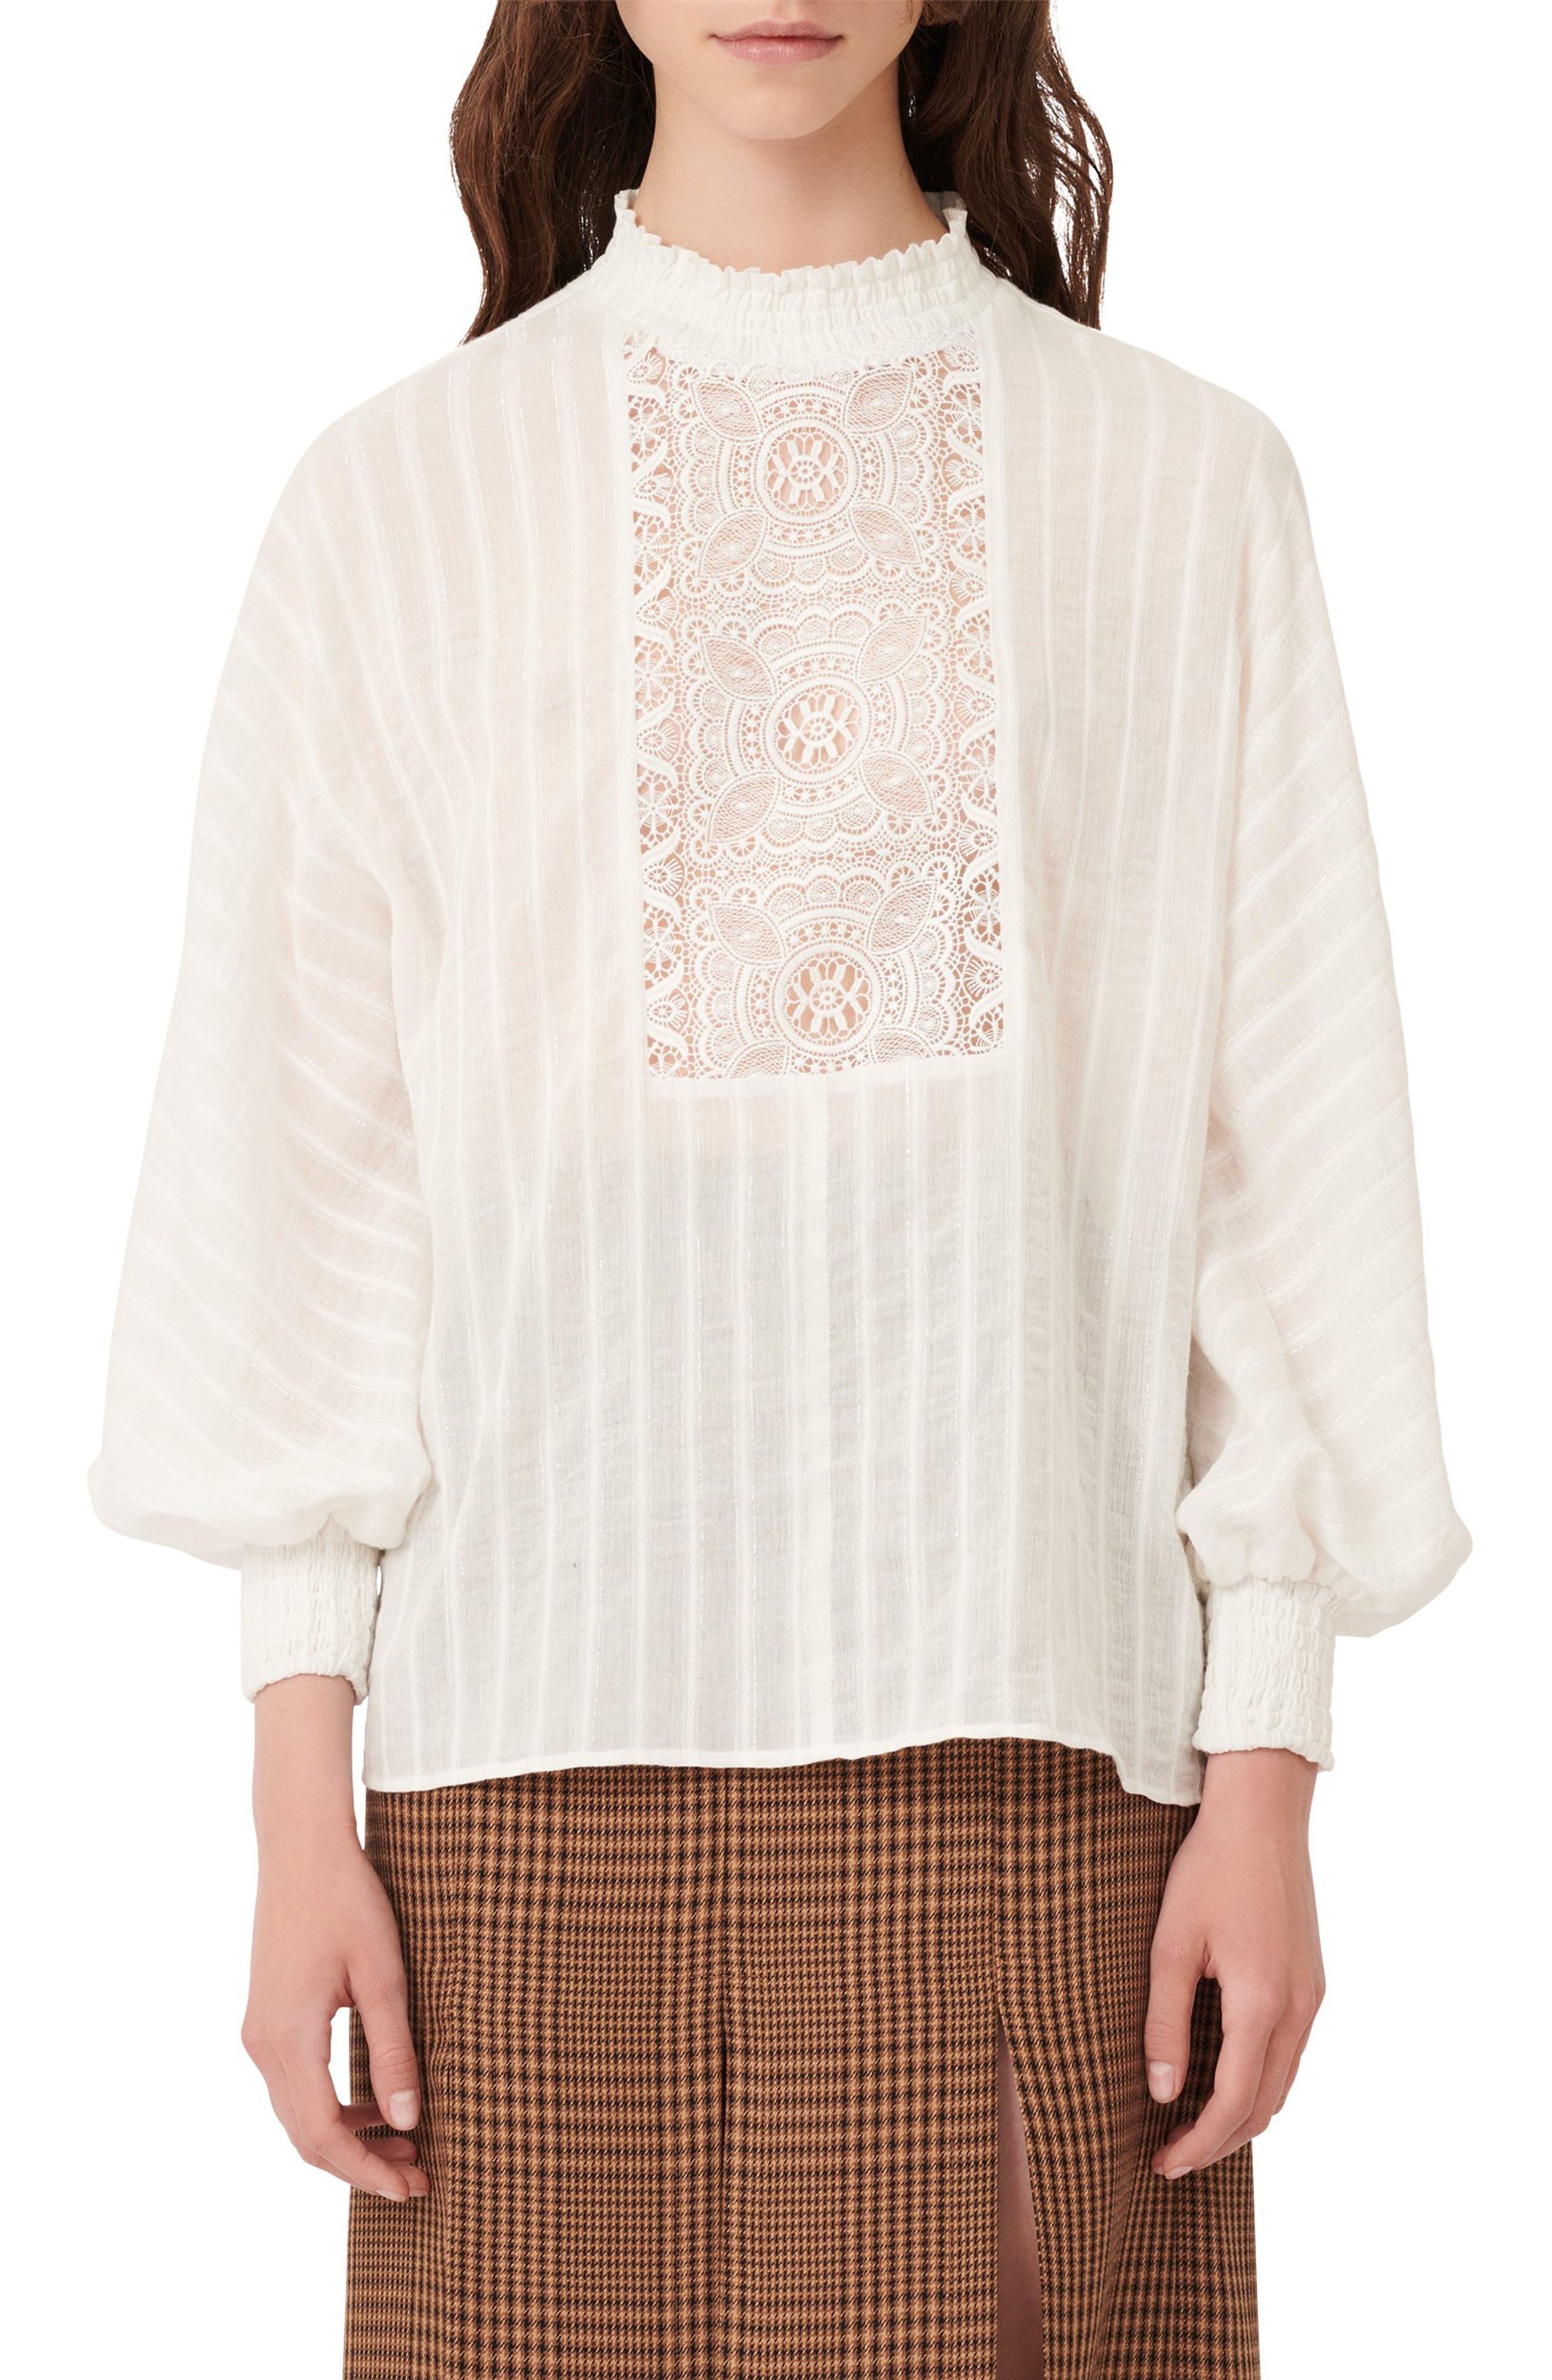 Edwardian Blouses | White & Black Lace Blouses & Sweaters Womens Maje Lace Bib Long Sleeve Blouse $177.00 AT vintagedancer.com